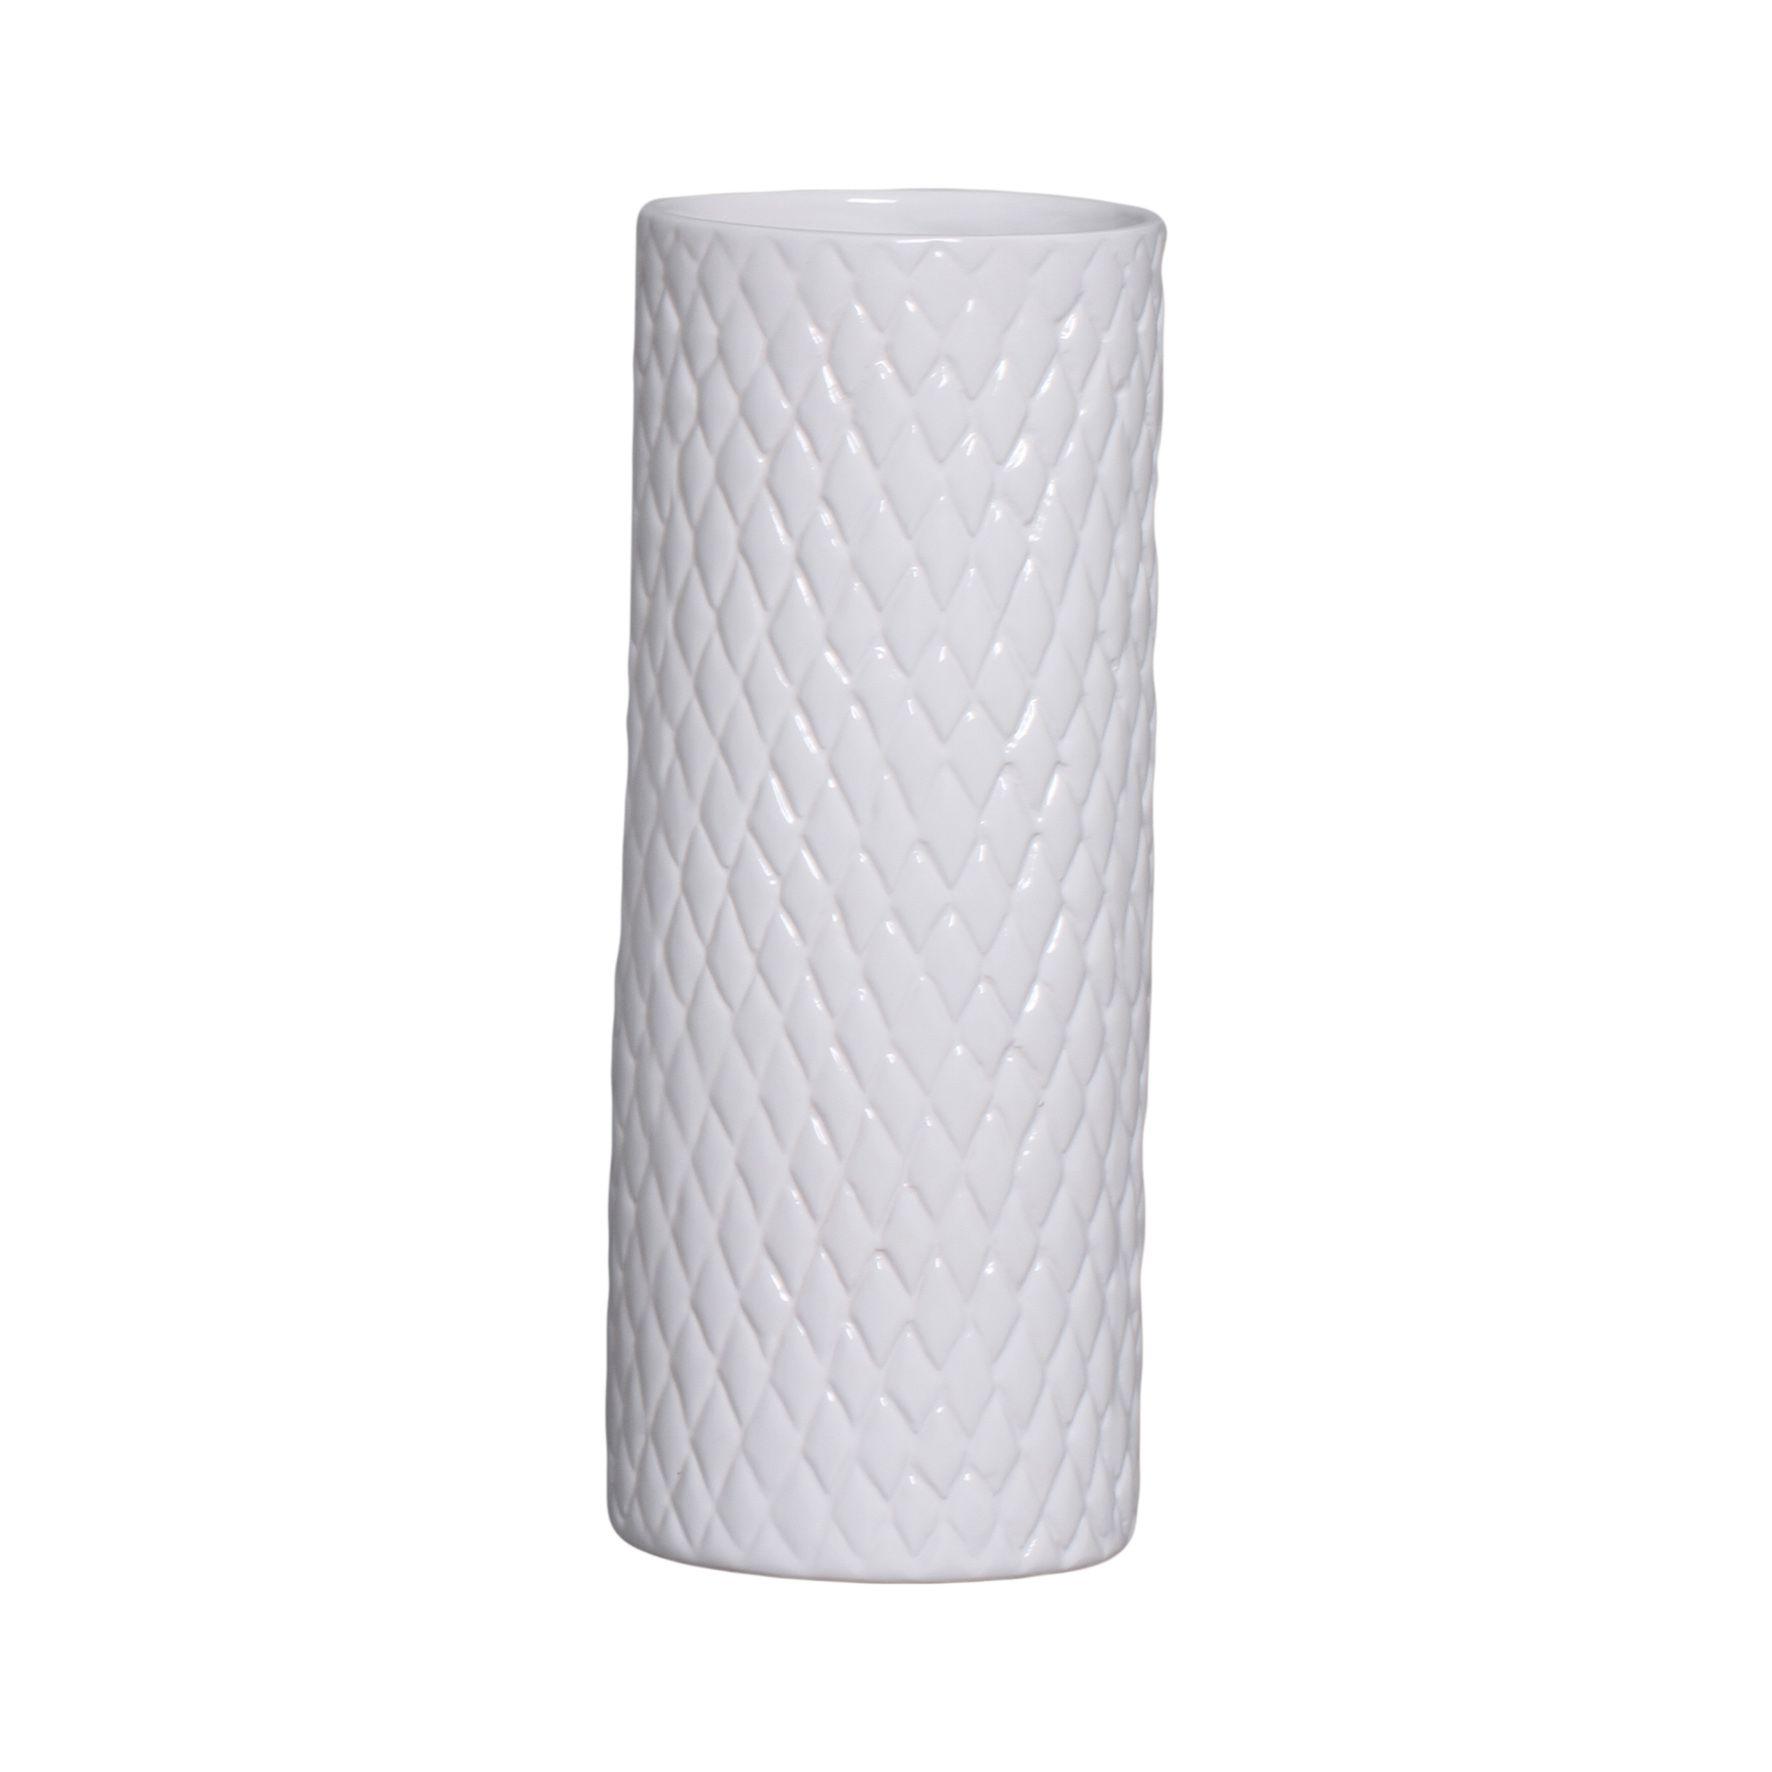 Cachepot de Cerâmica Branco 32,7 x 12,7 cm